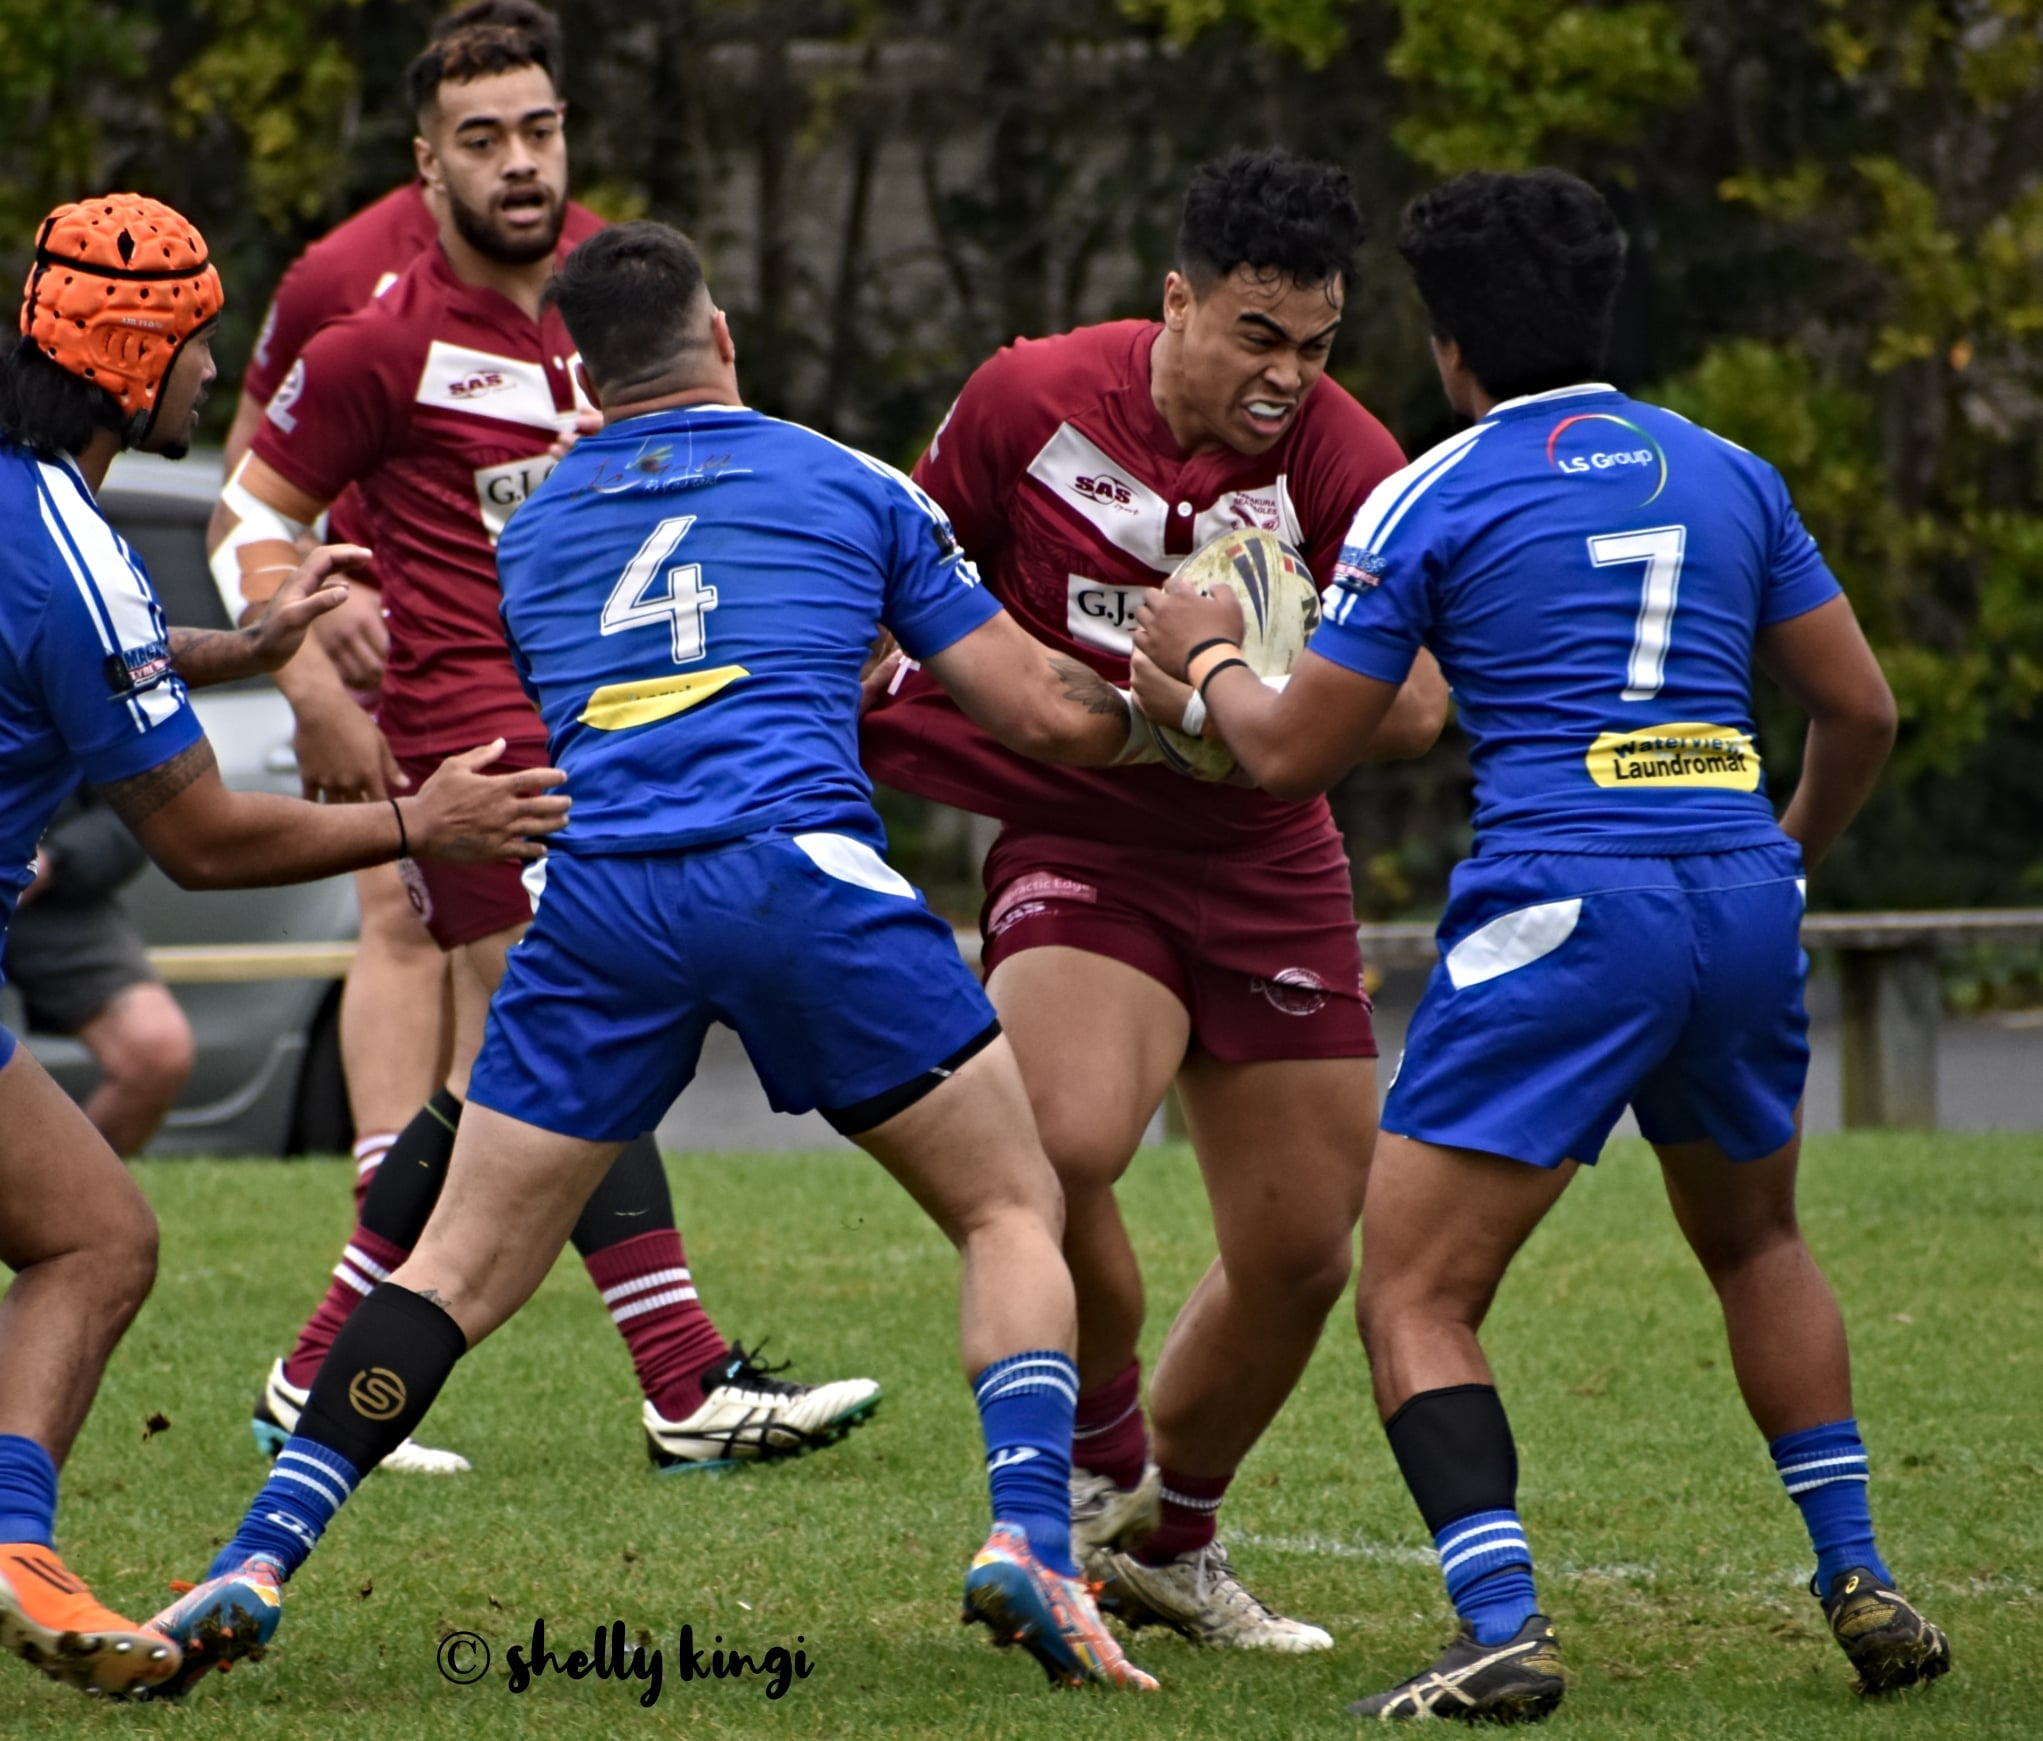 2021 Auckland Rugby League season cancelled